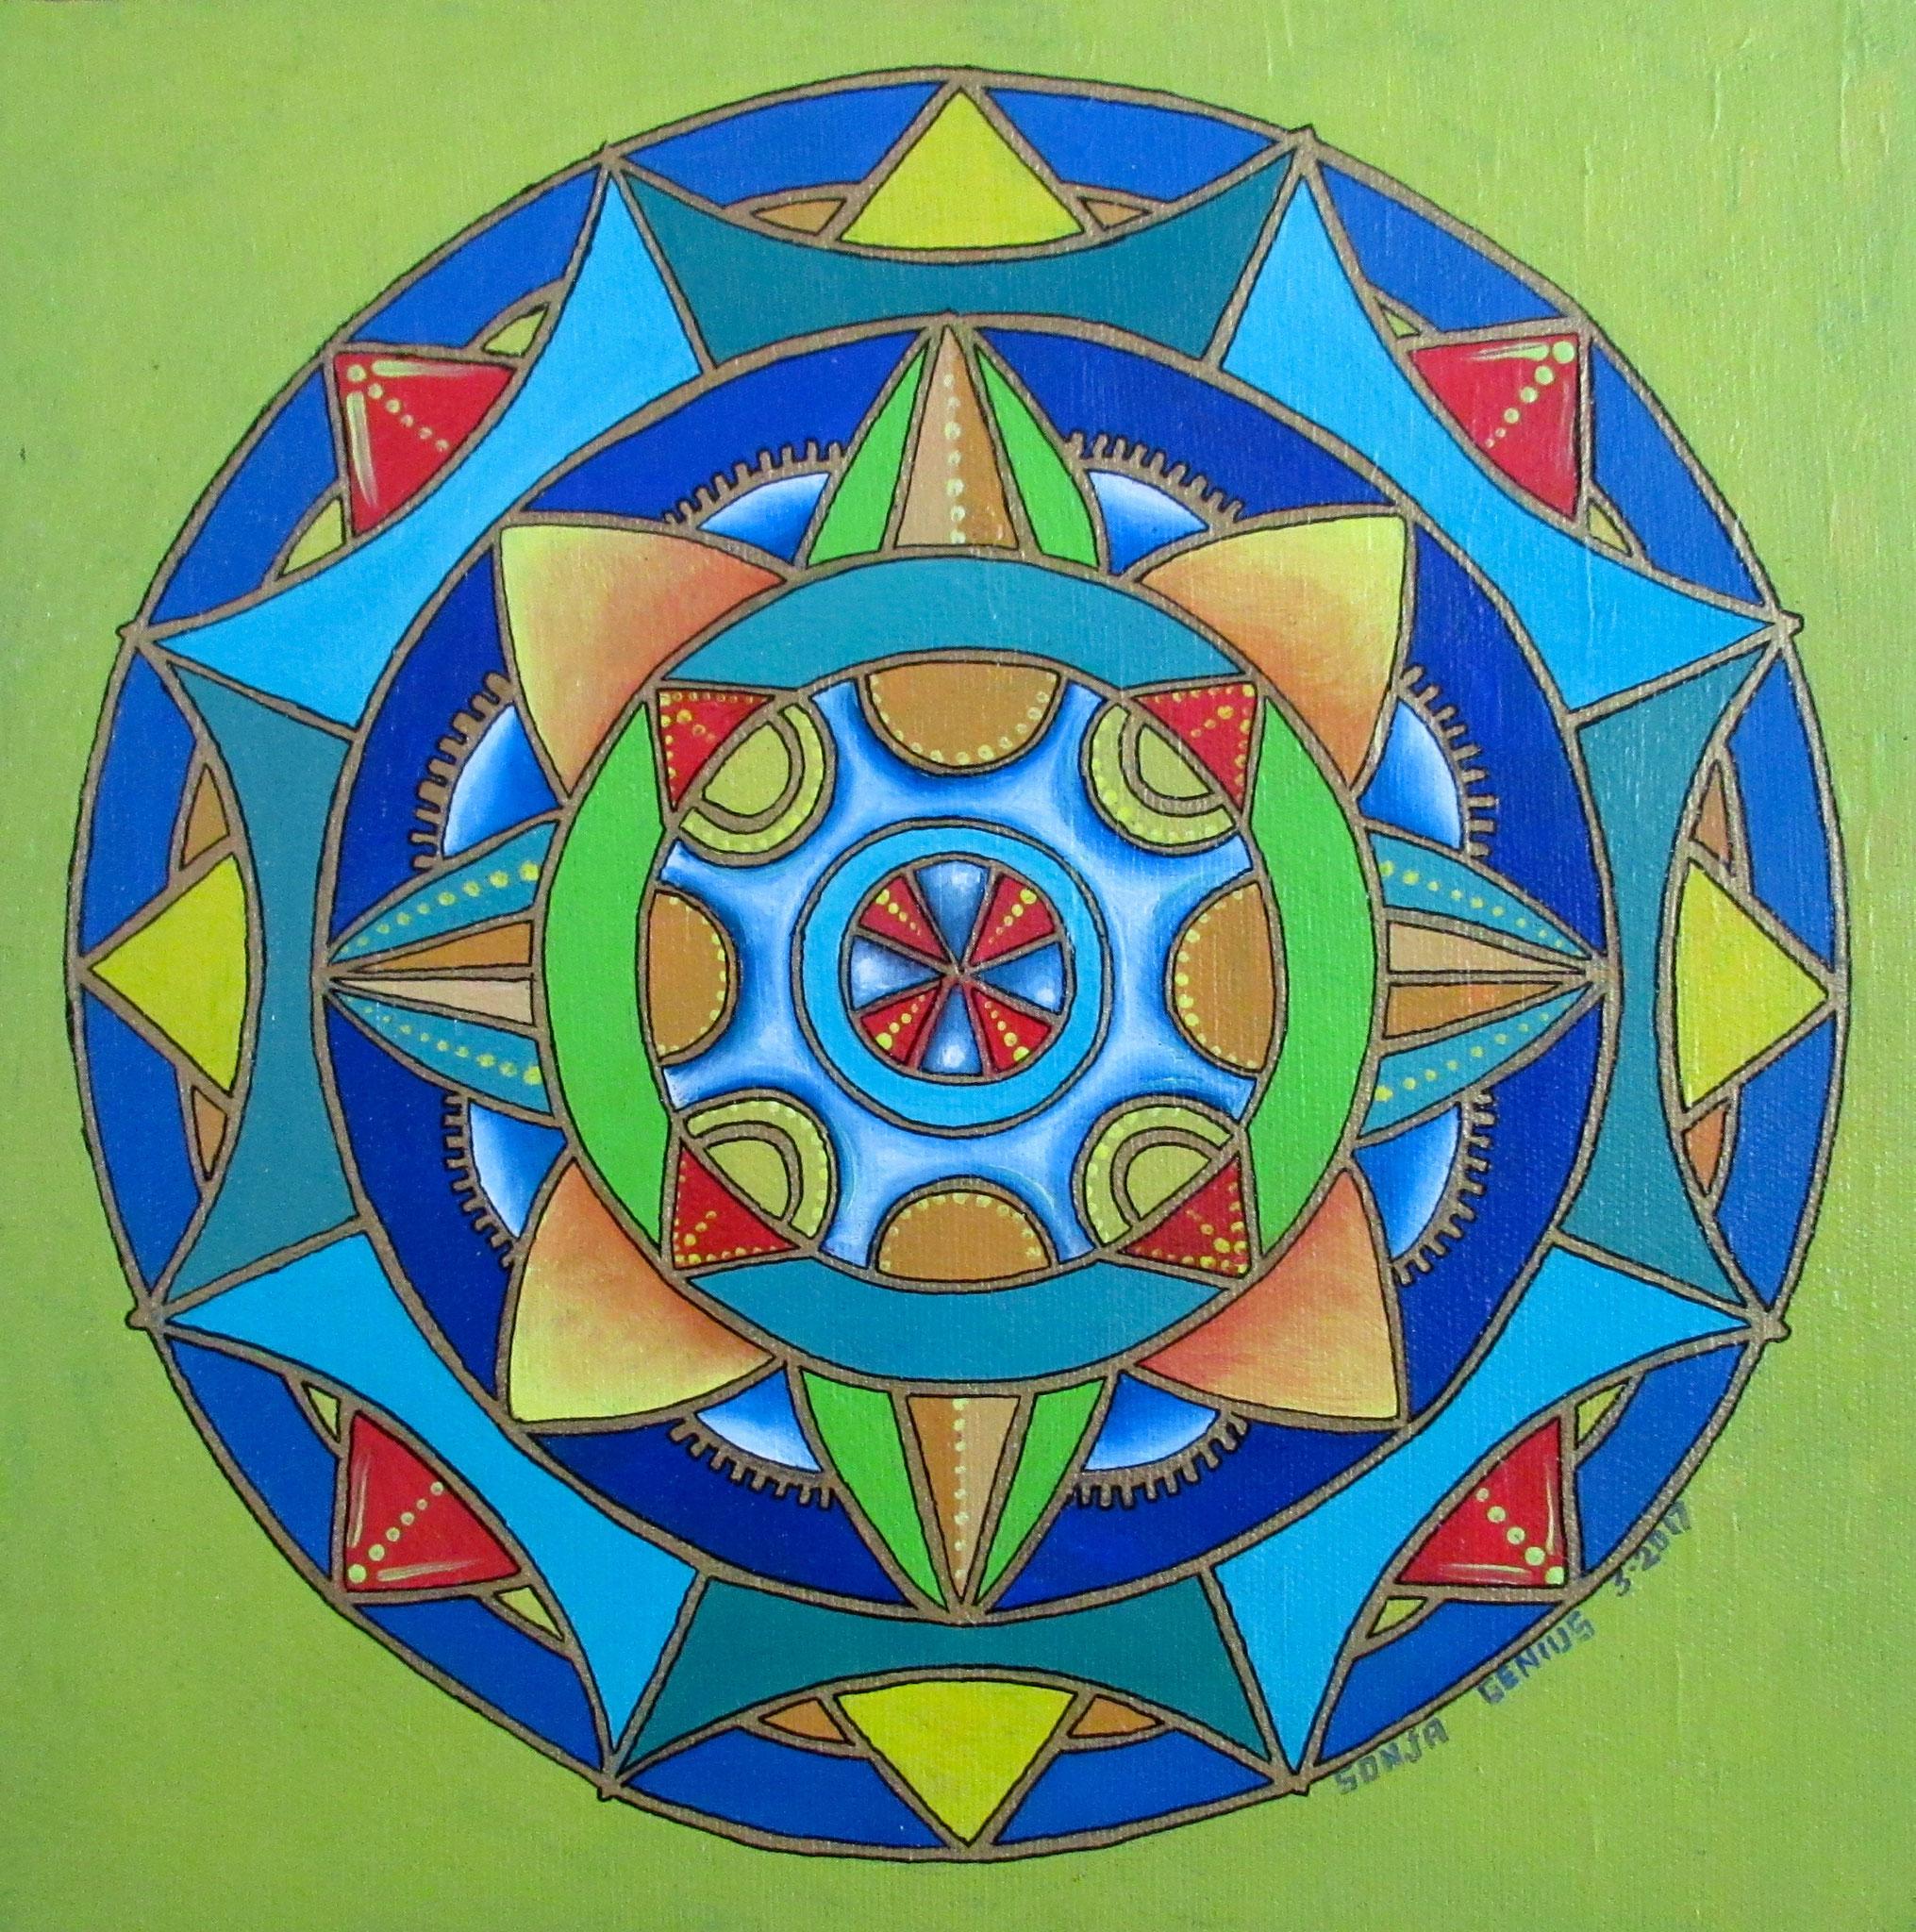 #432 - Hex Mandala II, oil on canvas 10x10, March 2017 (1)